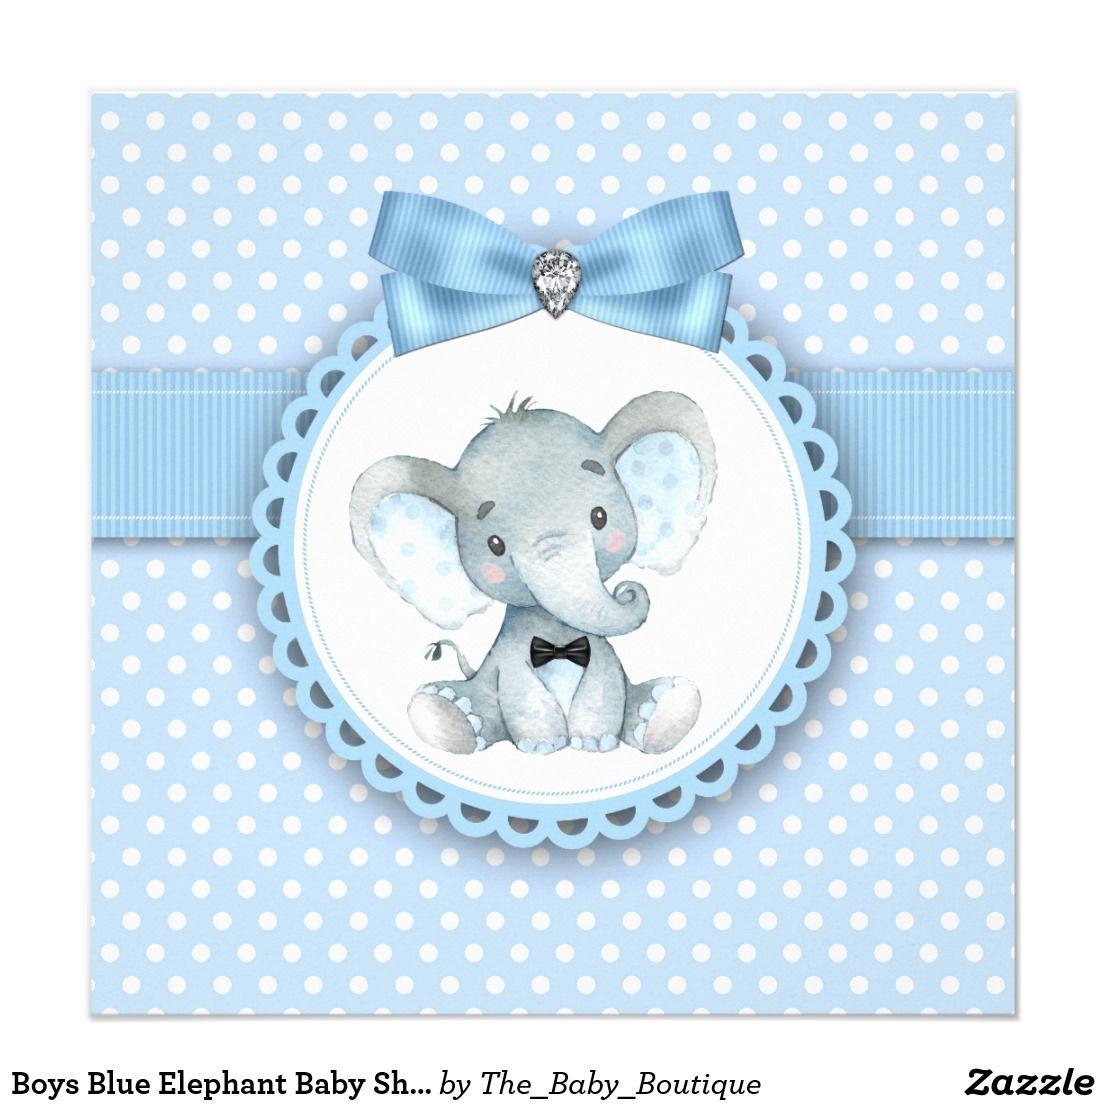 Boys Blue Elephant Baby Shower Invitations Elephant baby showers